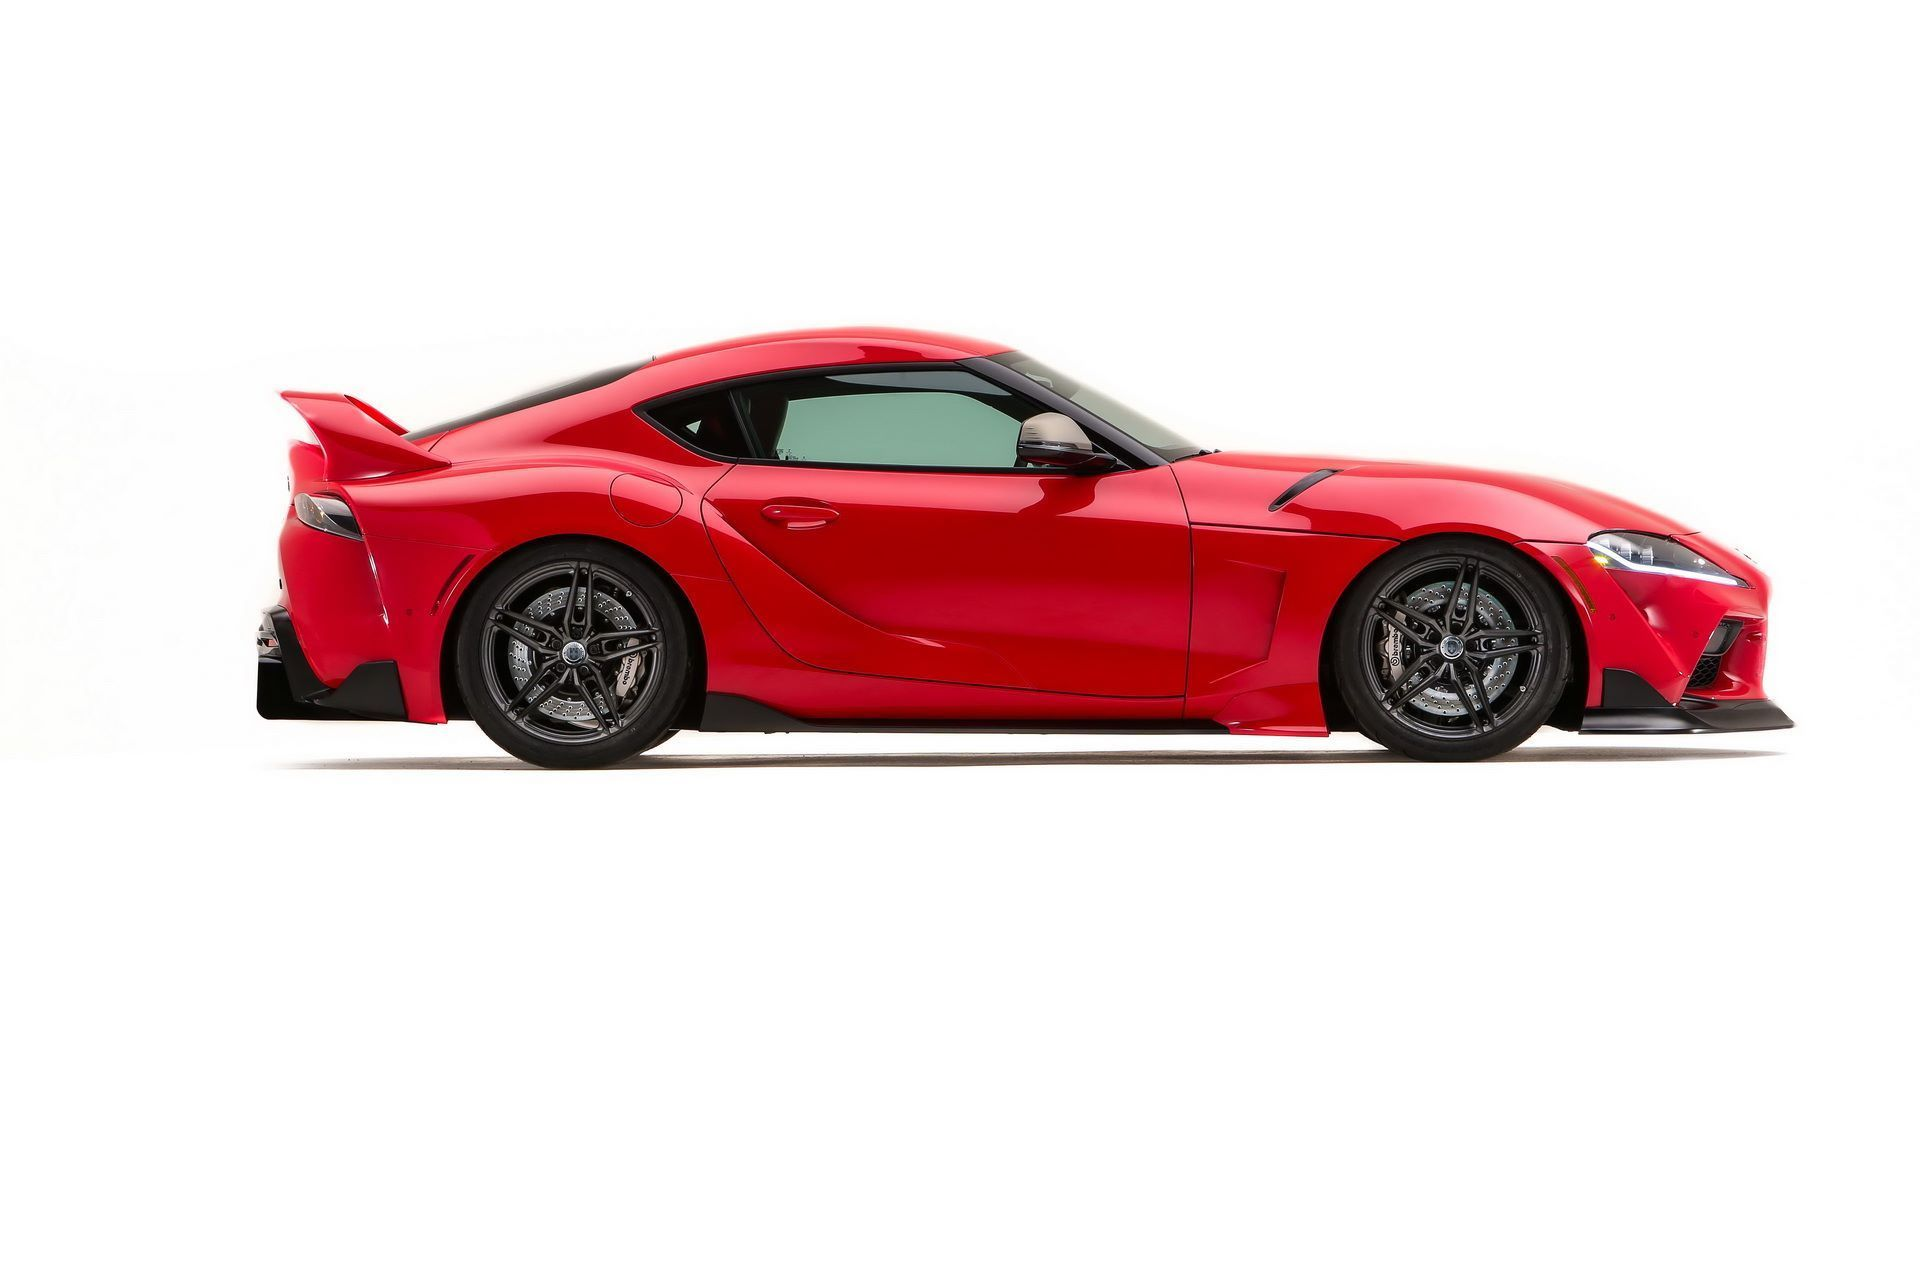 toyota-sema-2020-new-cars-32